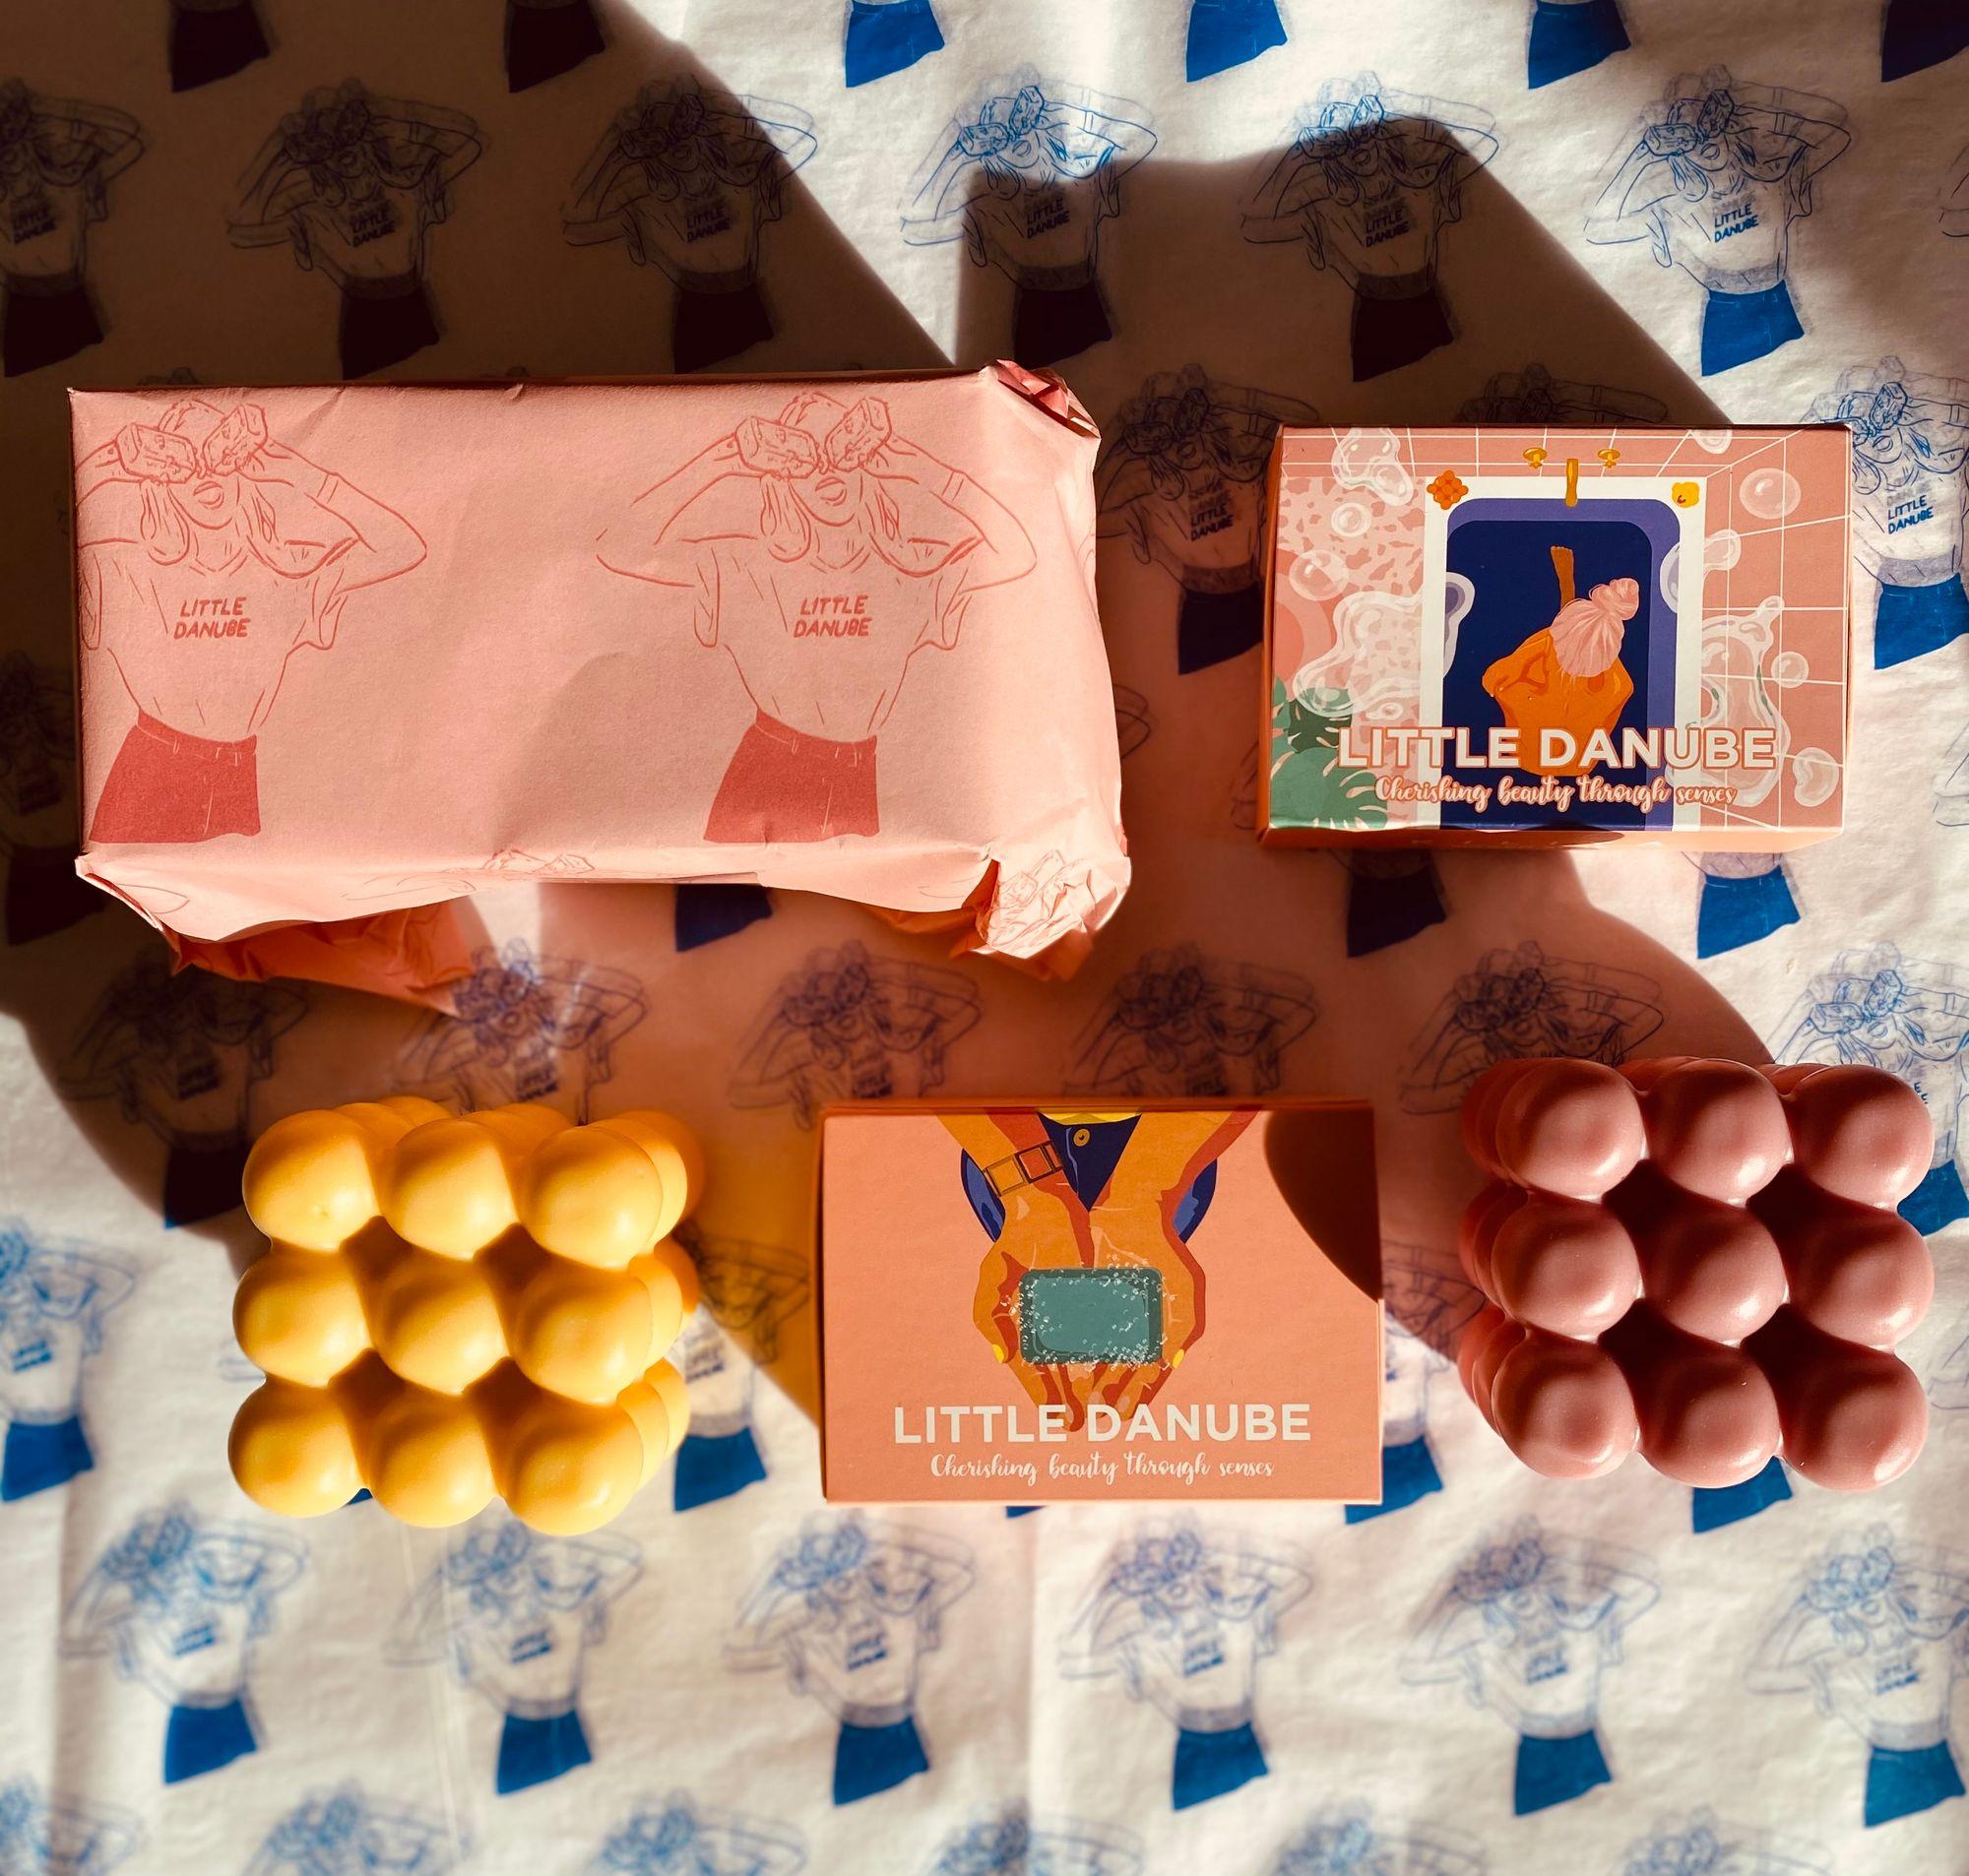 Little Danube: Beautiful Vegan Soap Bars that Heighten Your Senses